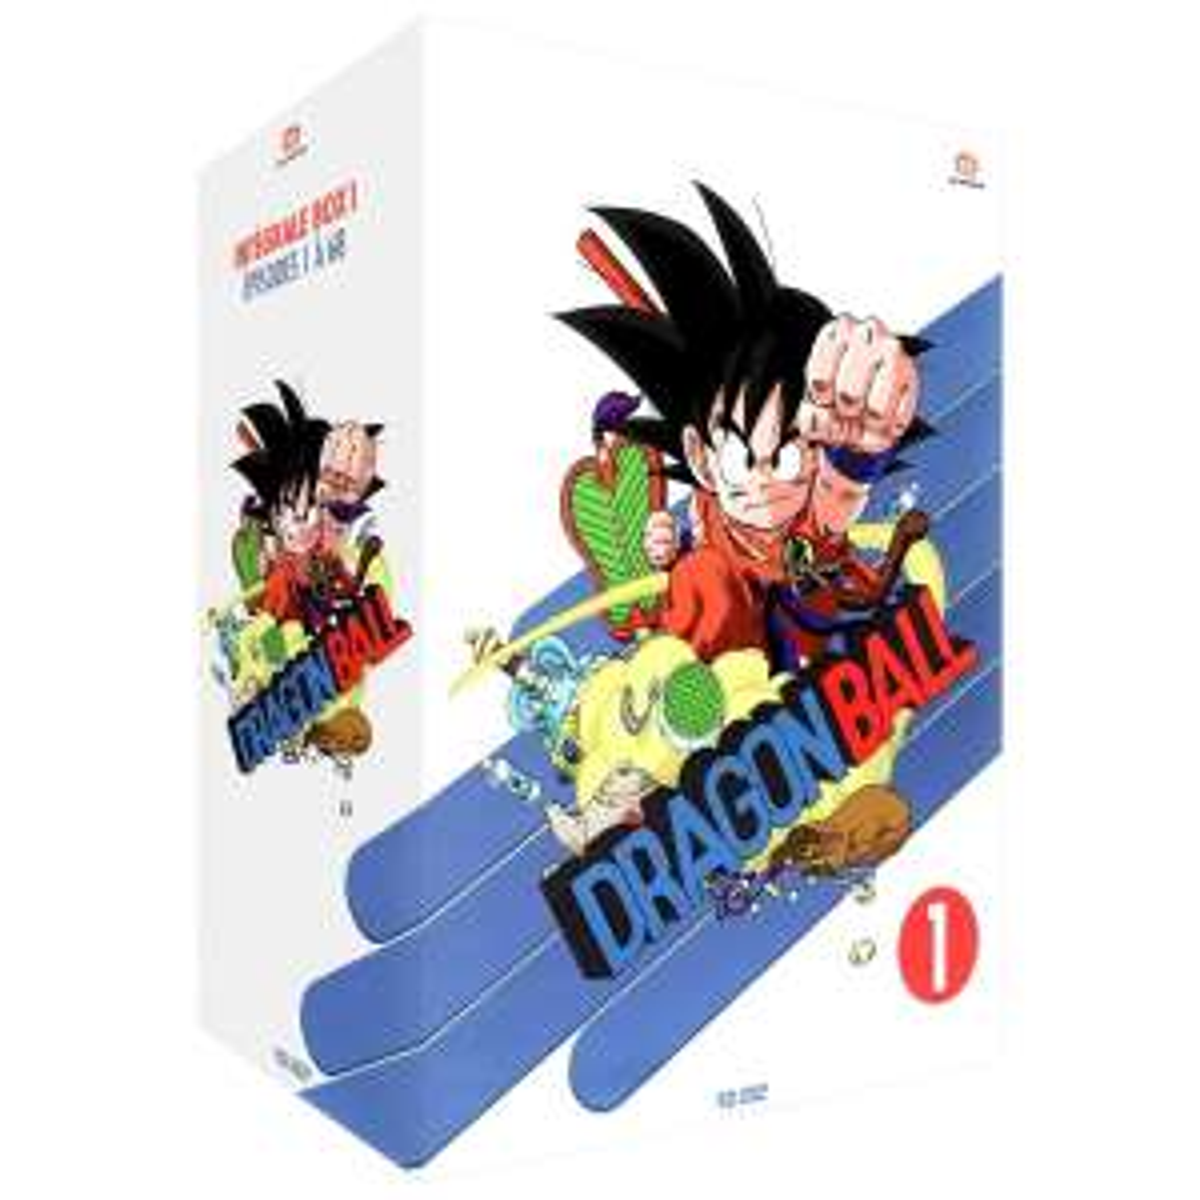 DVD Dragon Ball - Intégrale Box 1 [Non censuré]